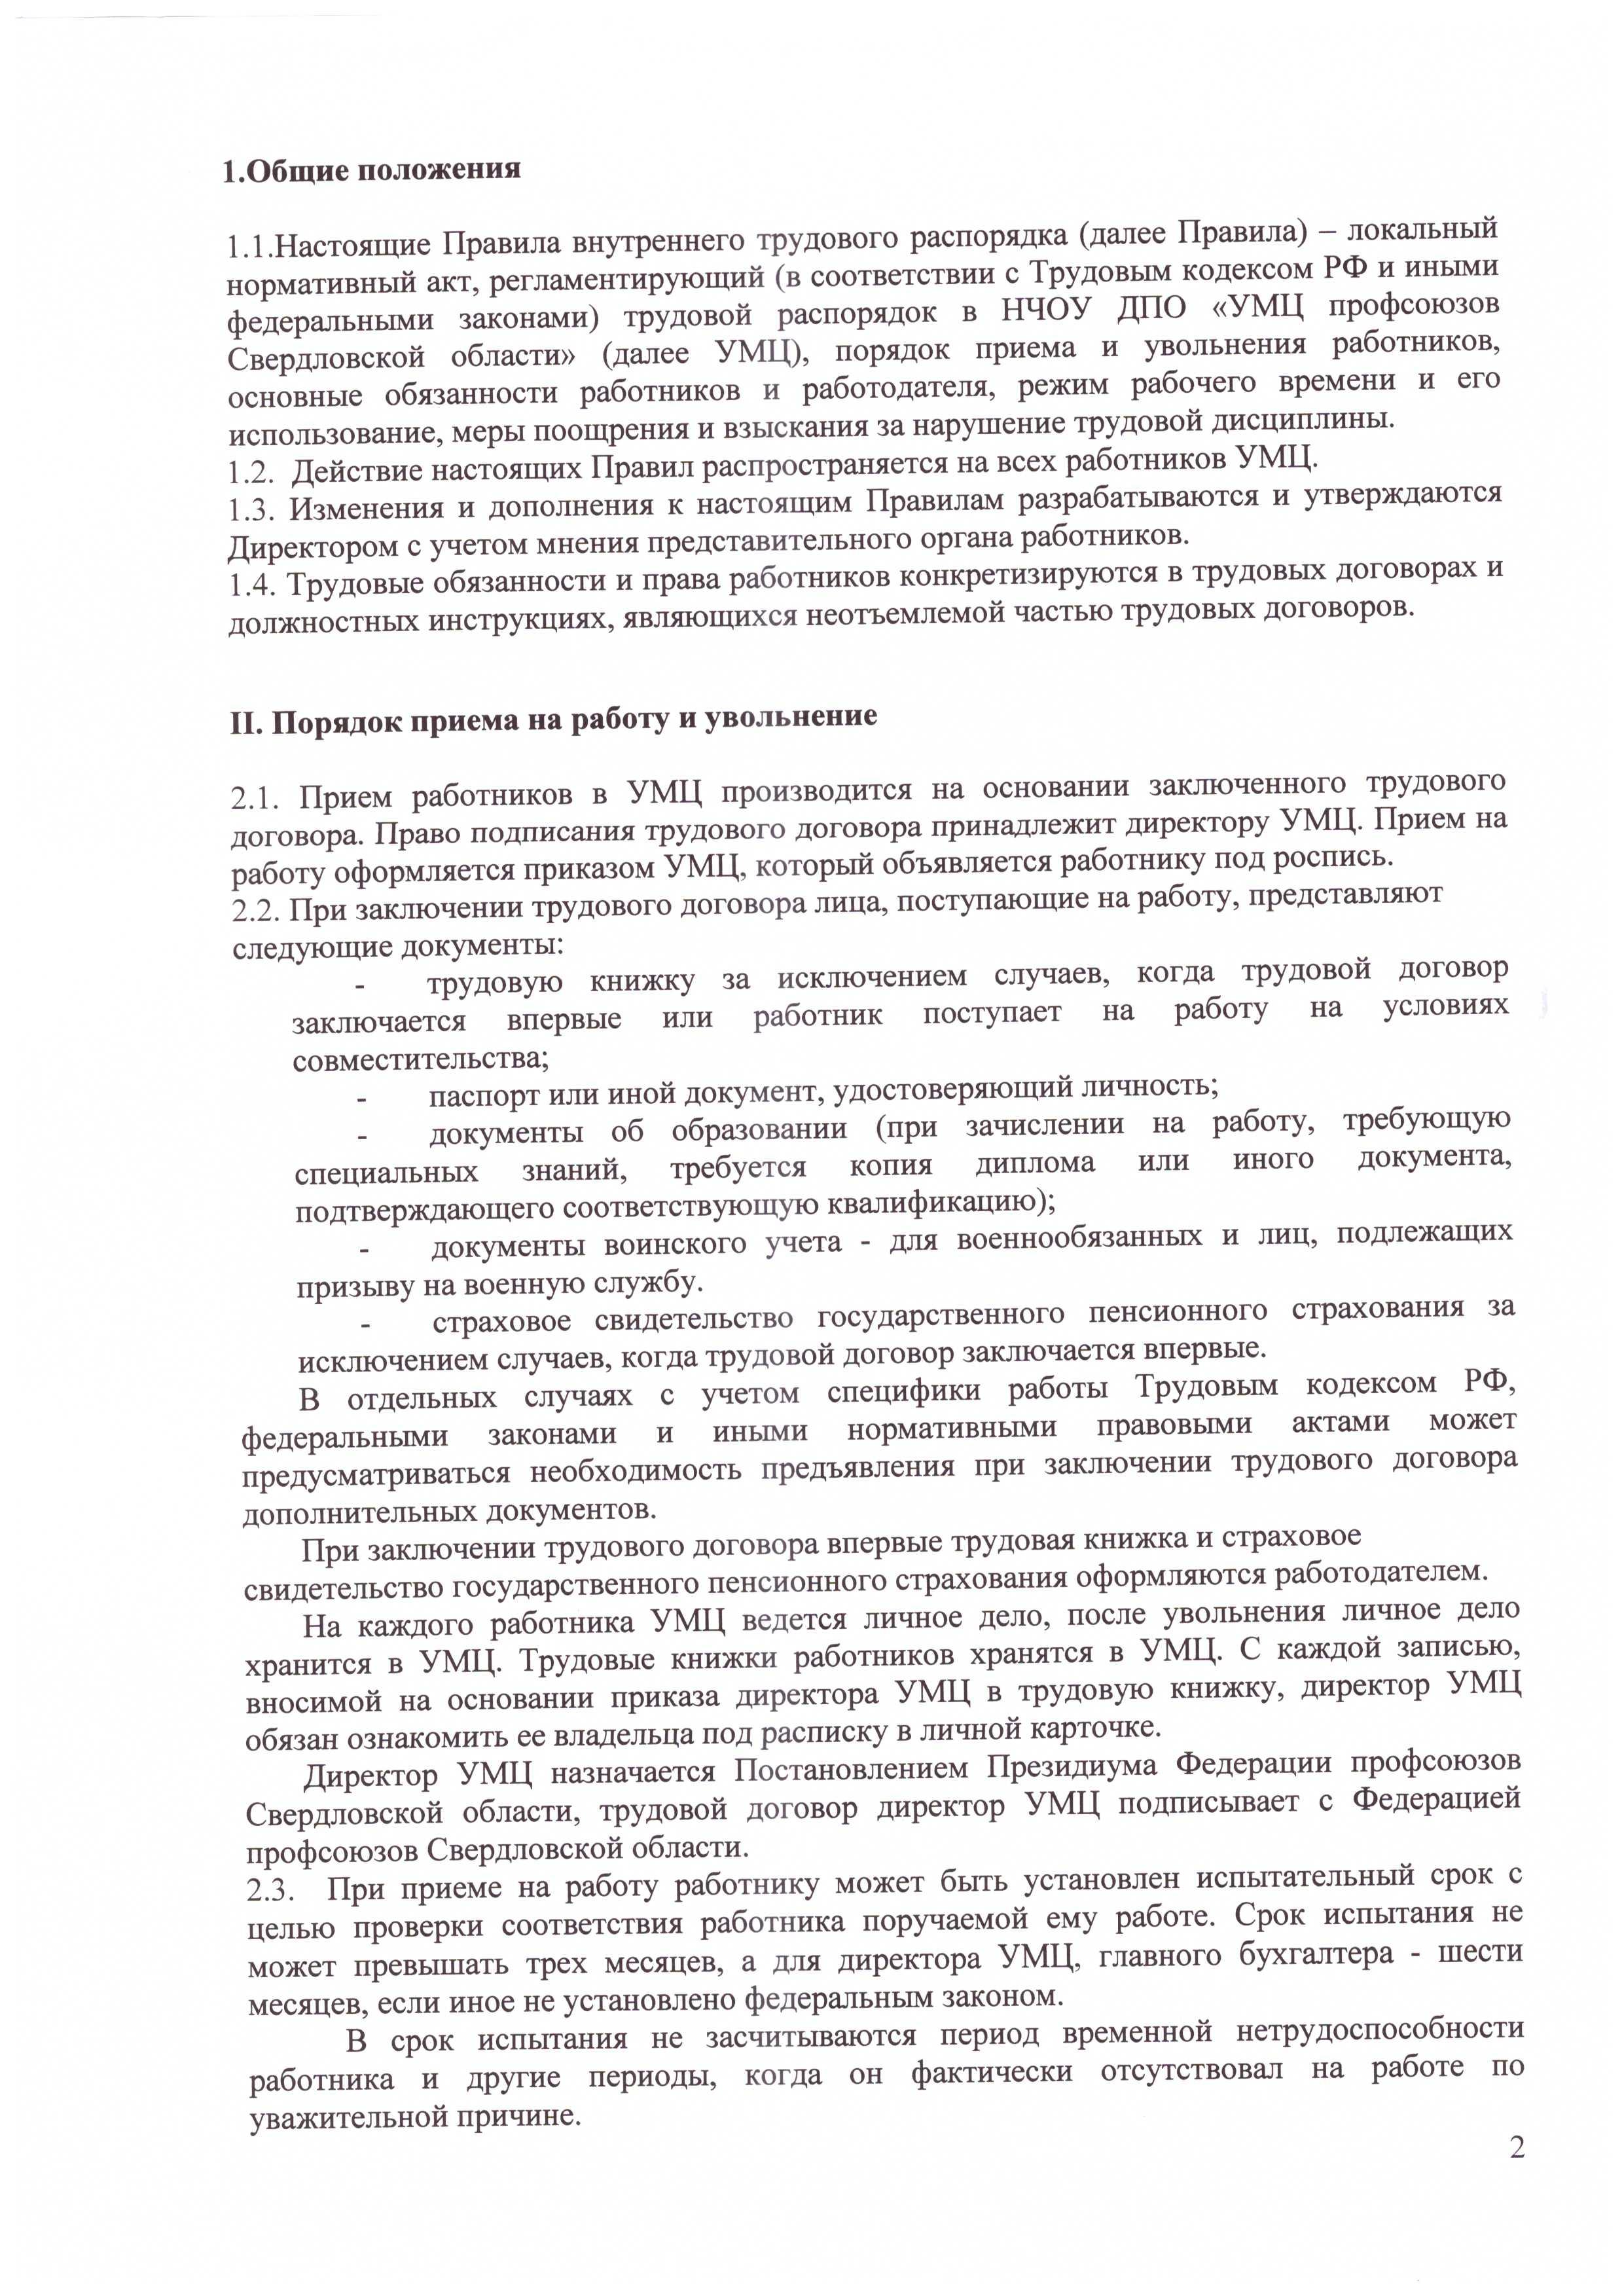 SCAN_правила внутр.распор_Страница_2